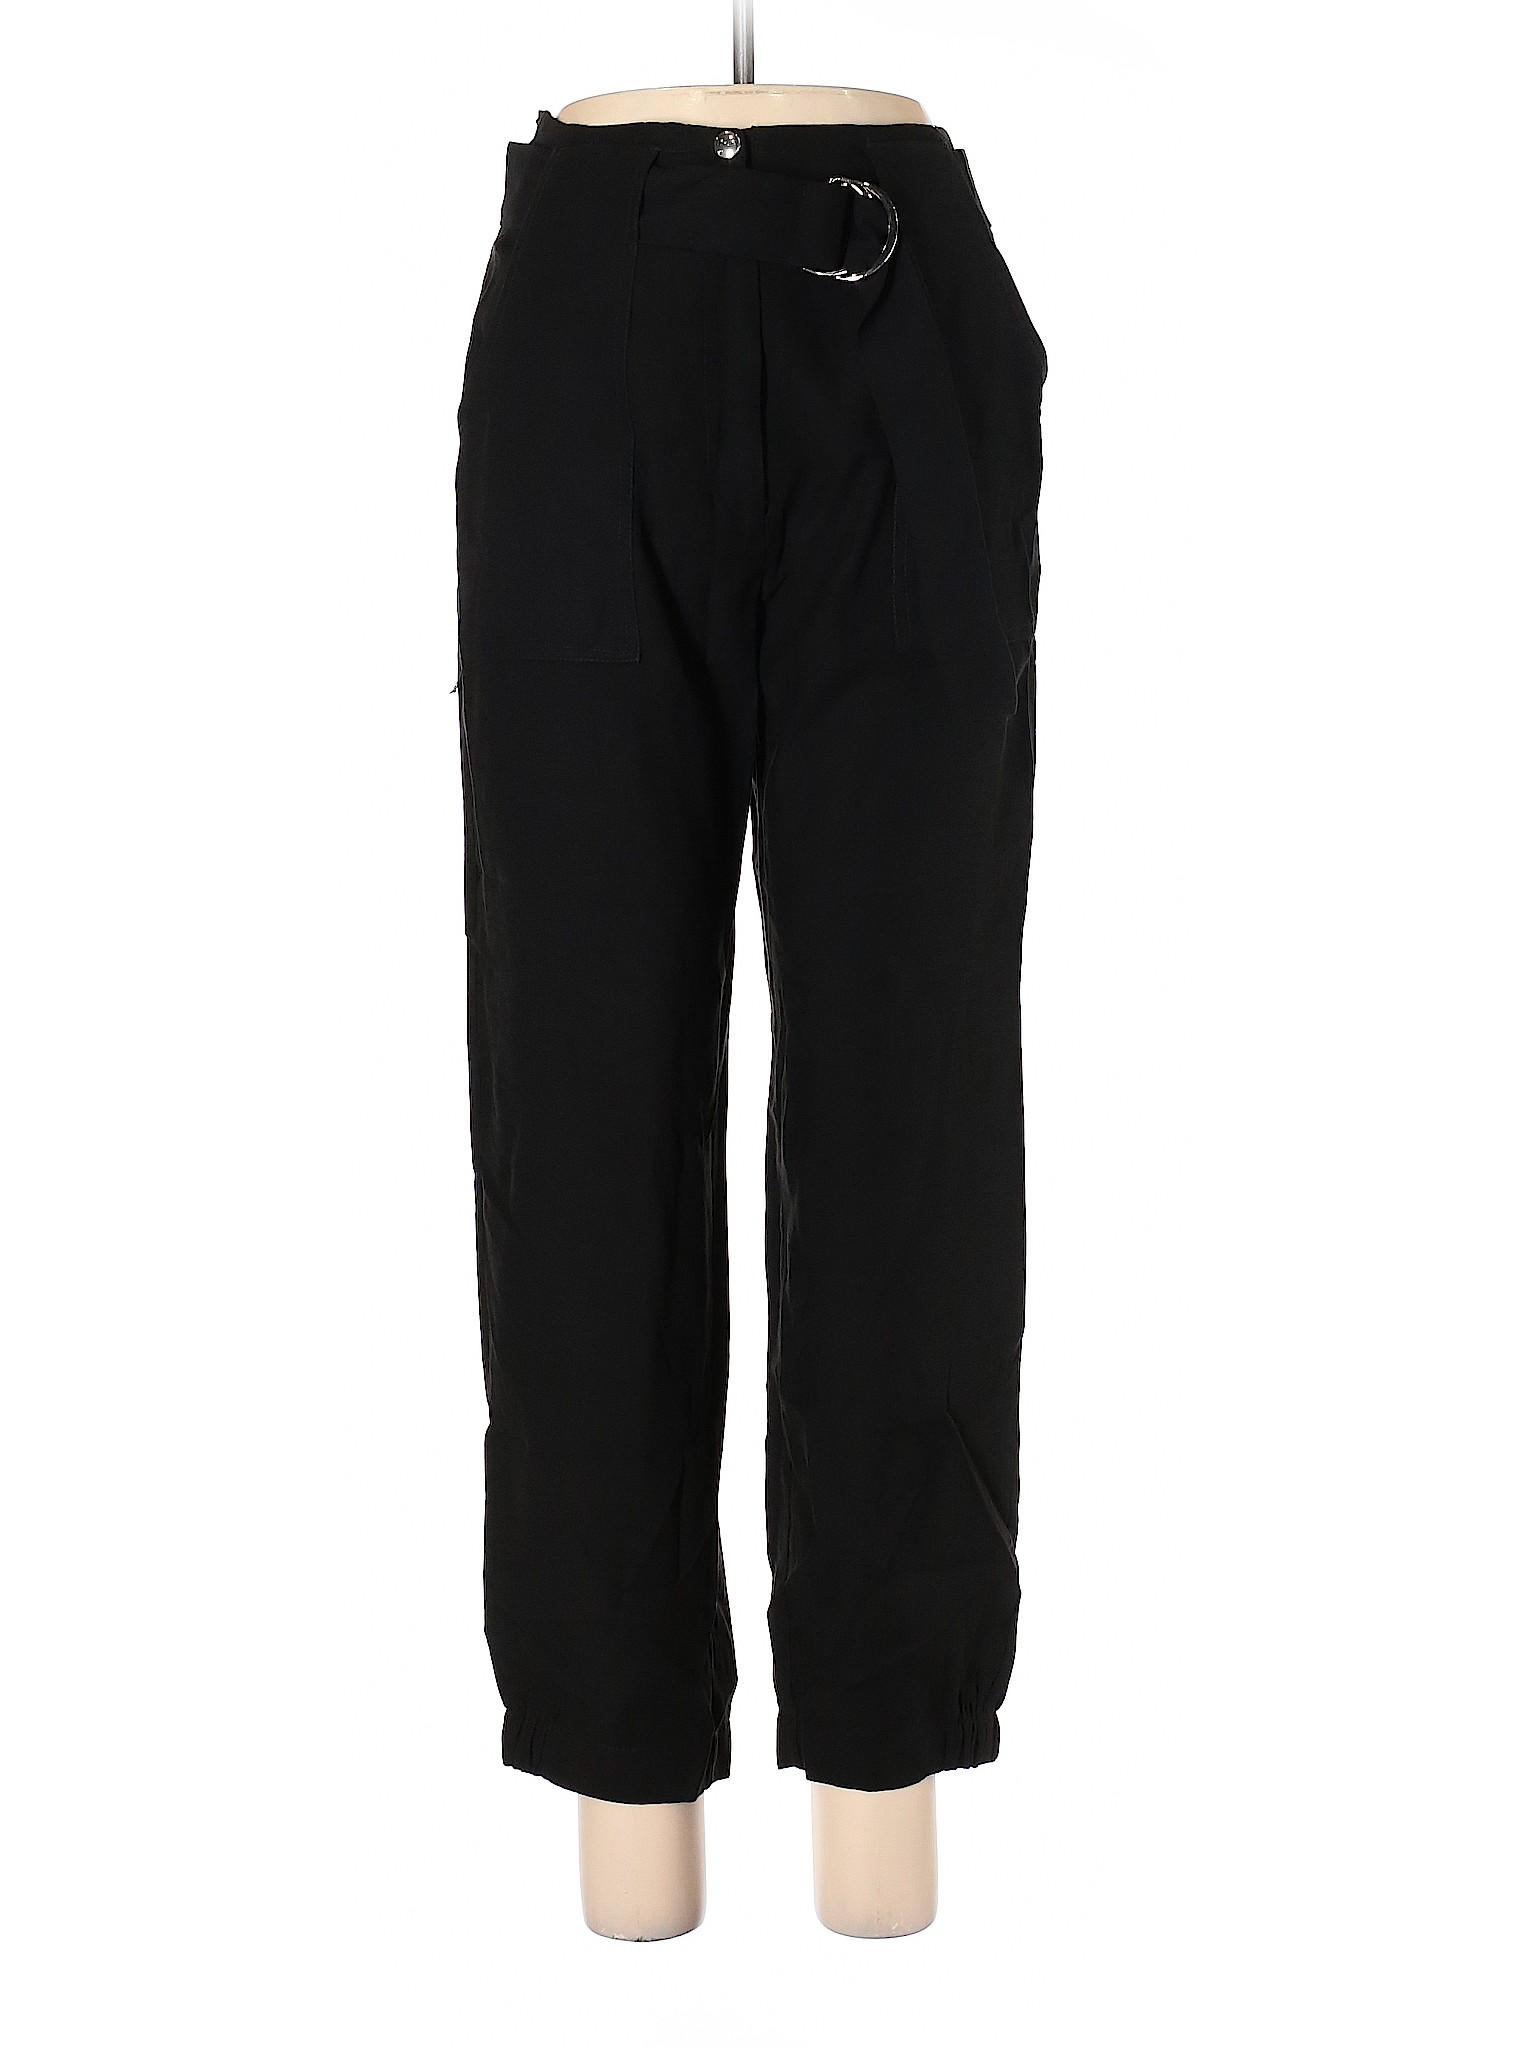 Pull & Bear Women Black Casual Pants L | eBay